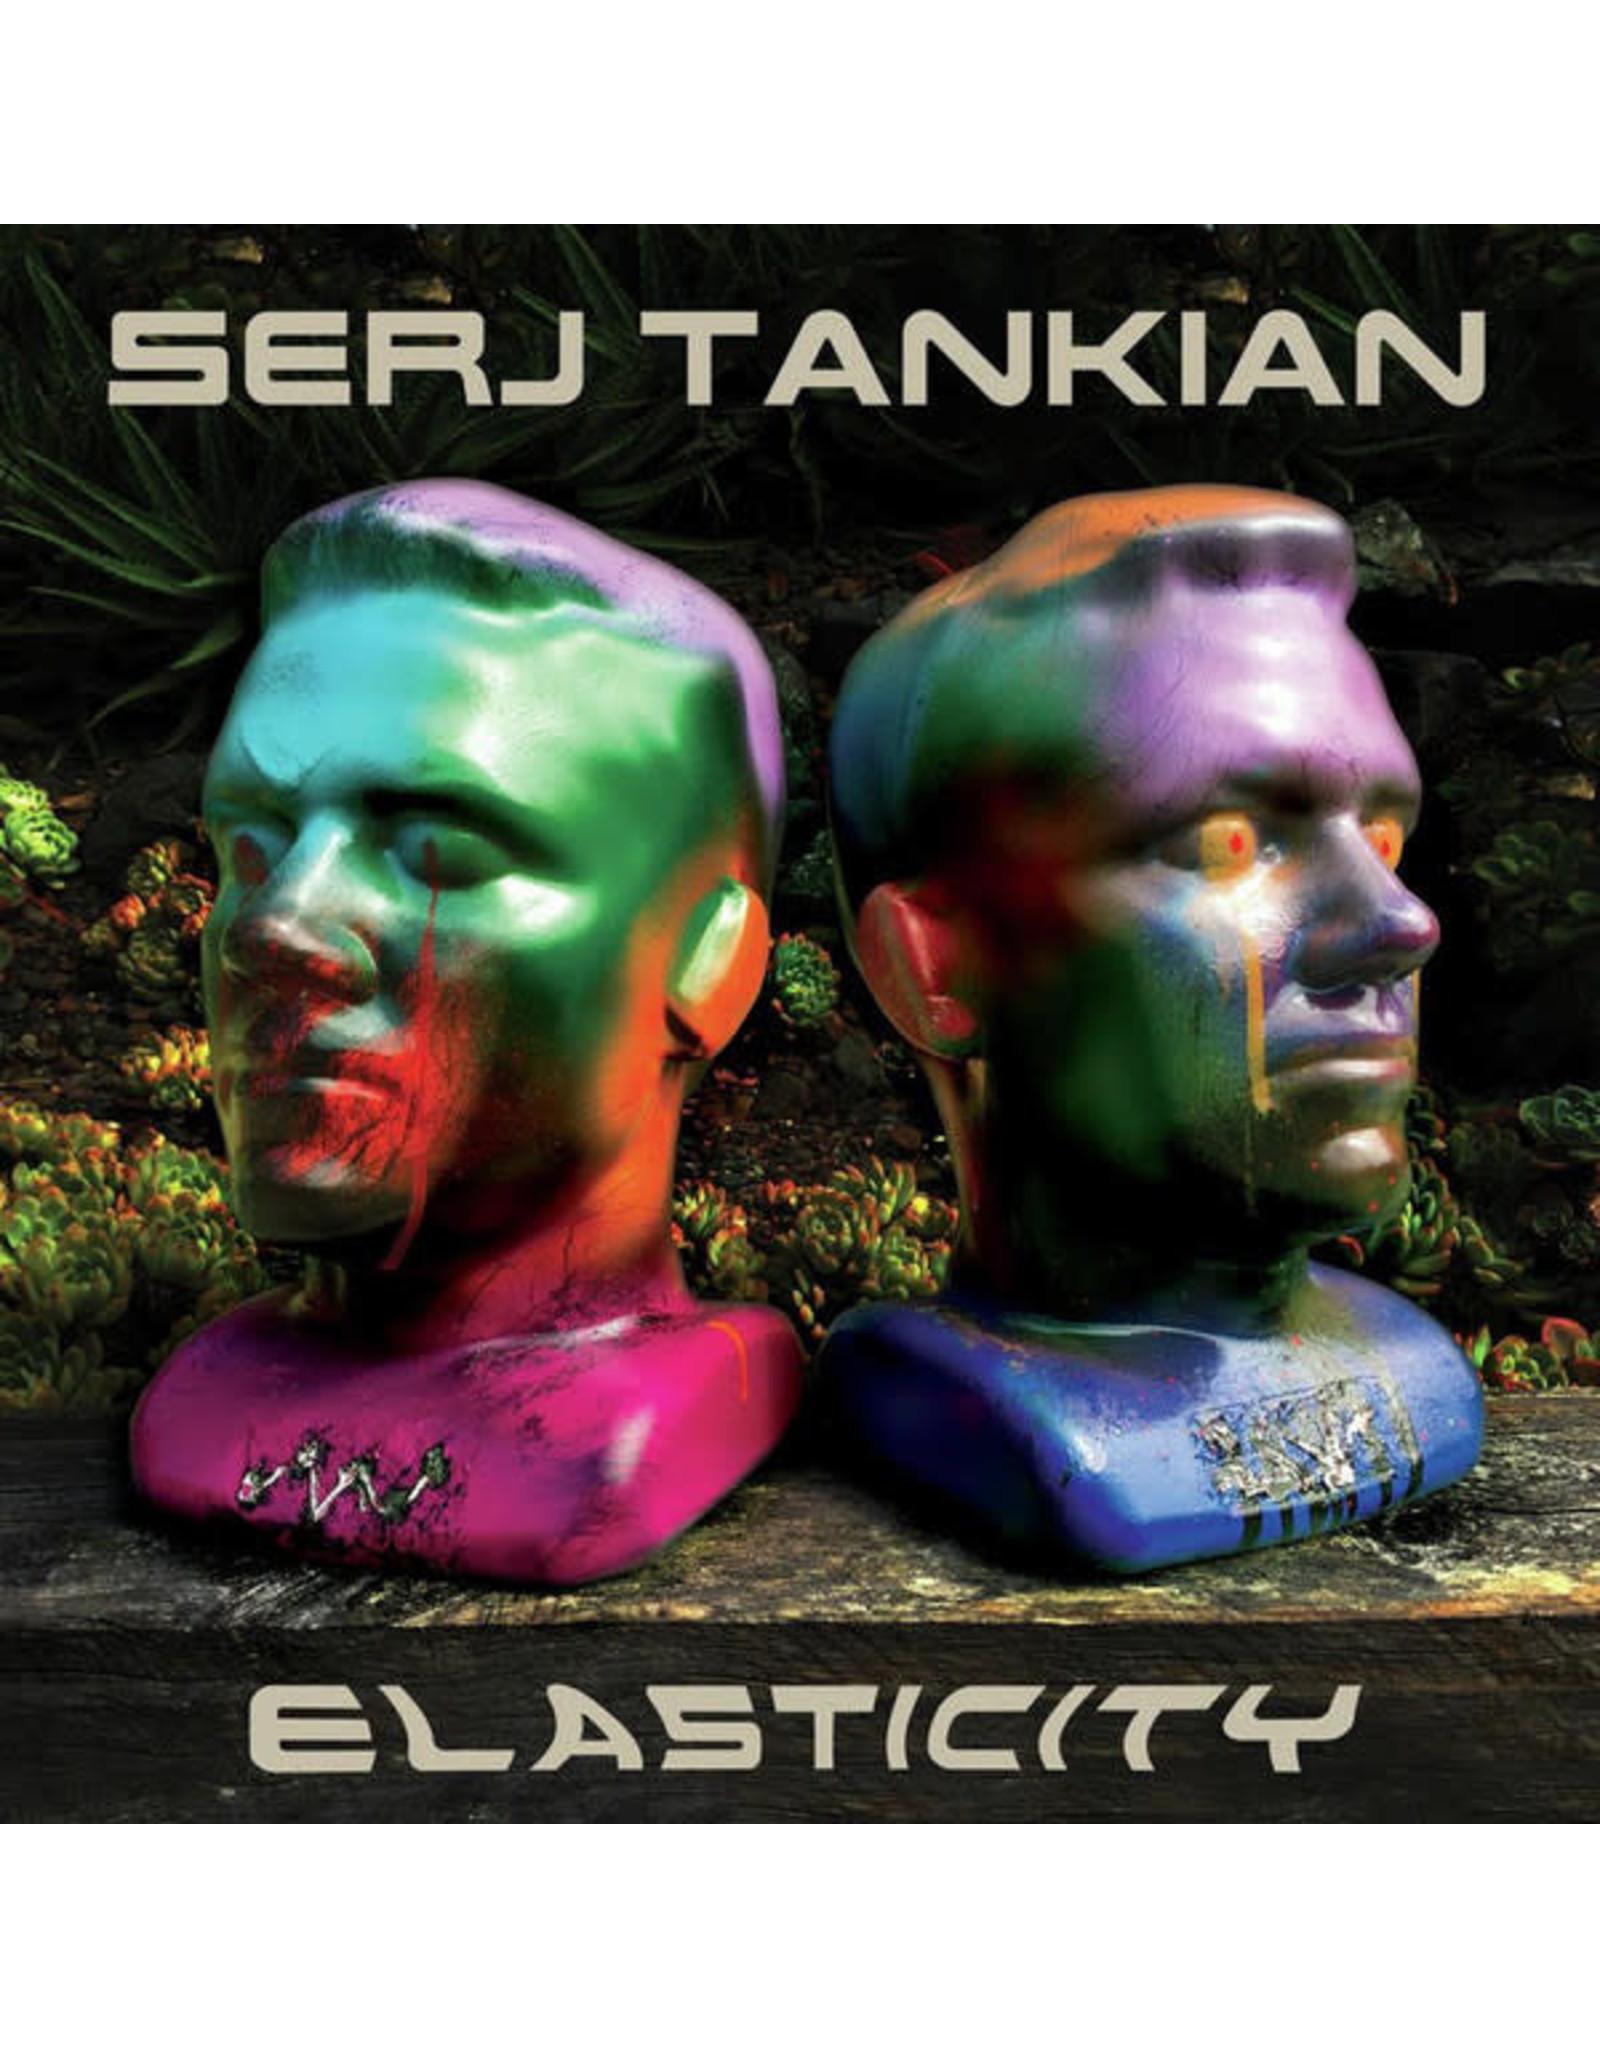 "New Vinyl Serj Tankian - Elasticity (Colored) EP 12"""